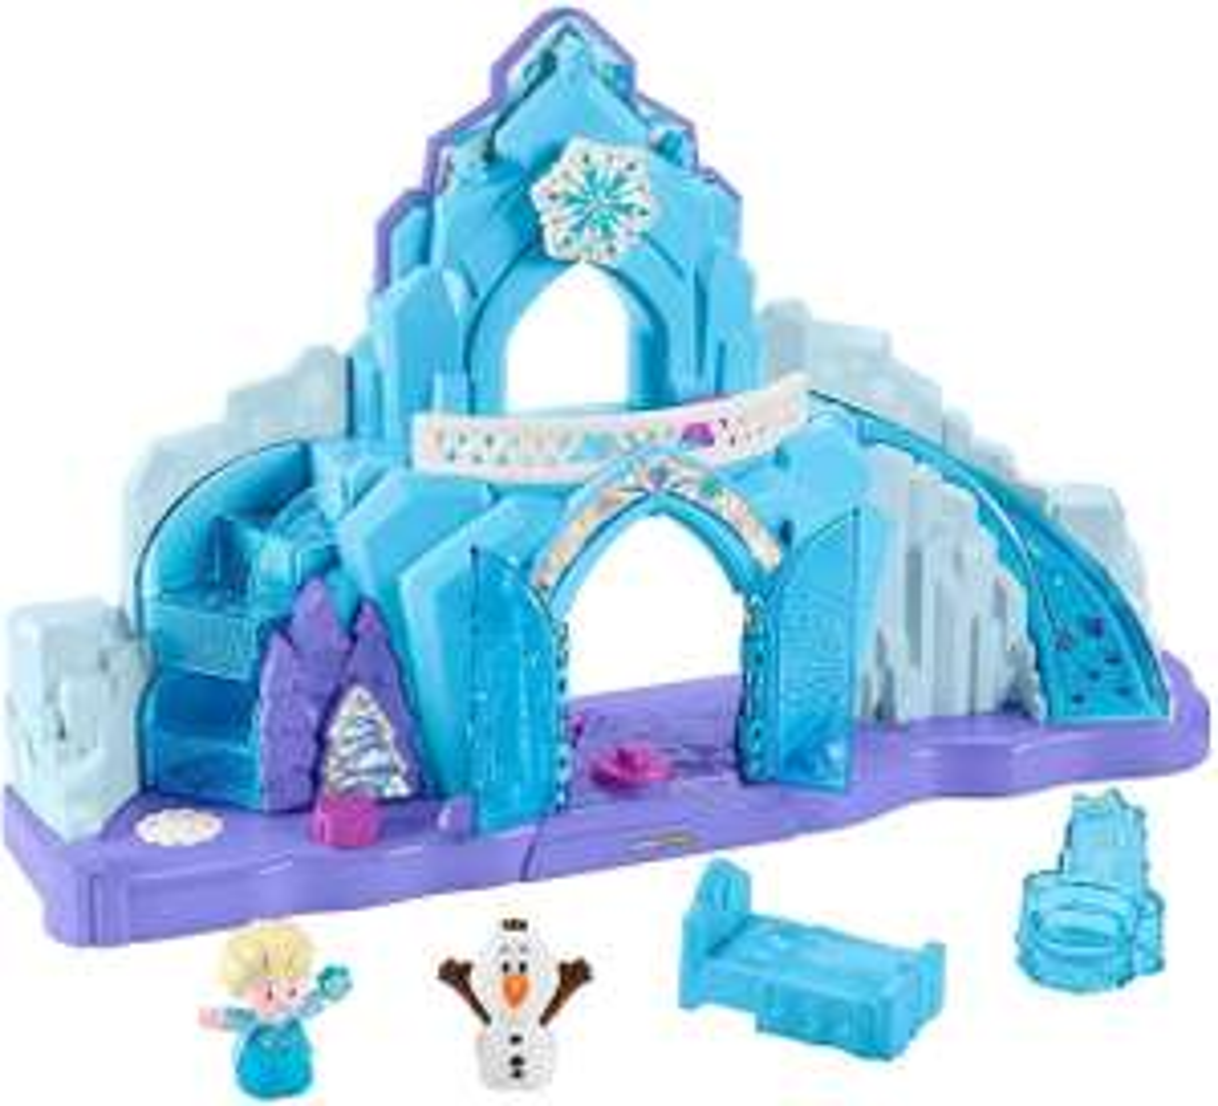 Little People GGV29 Fisher-Price Disney Frozen Elsa's Ice Palace, Musical Light-Up Playset, Multi-Colour £27.98 @ Amazon